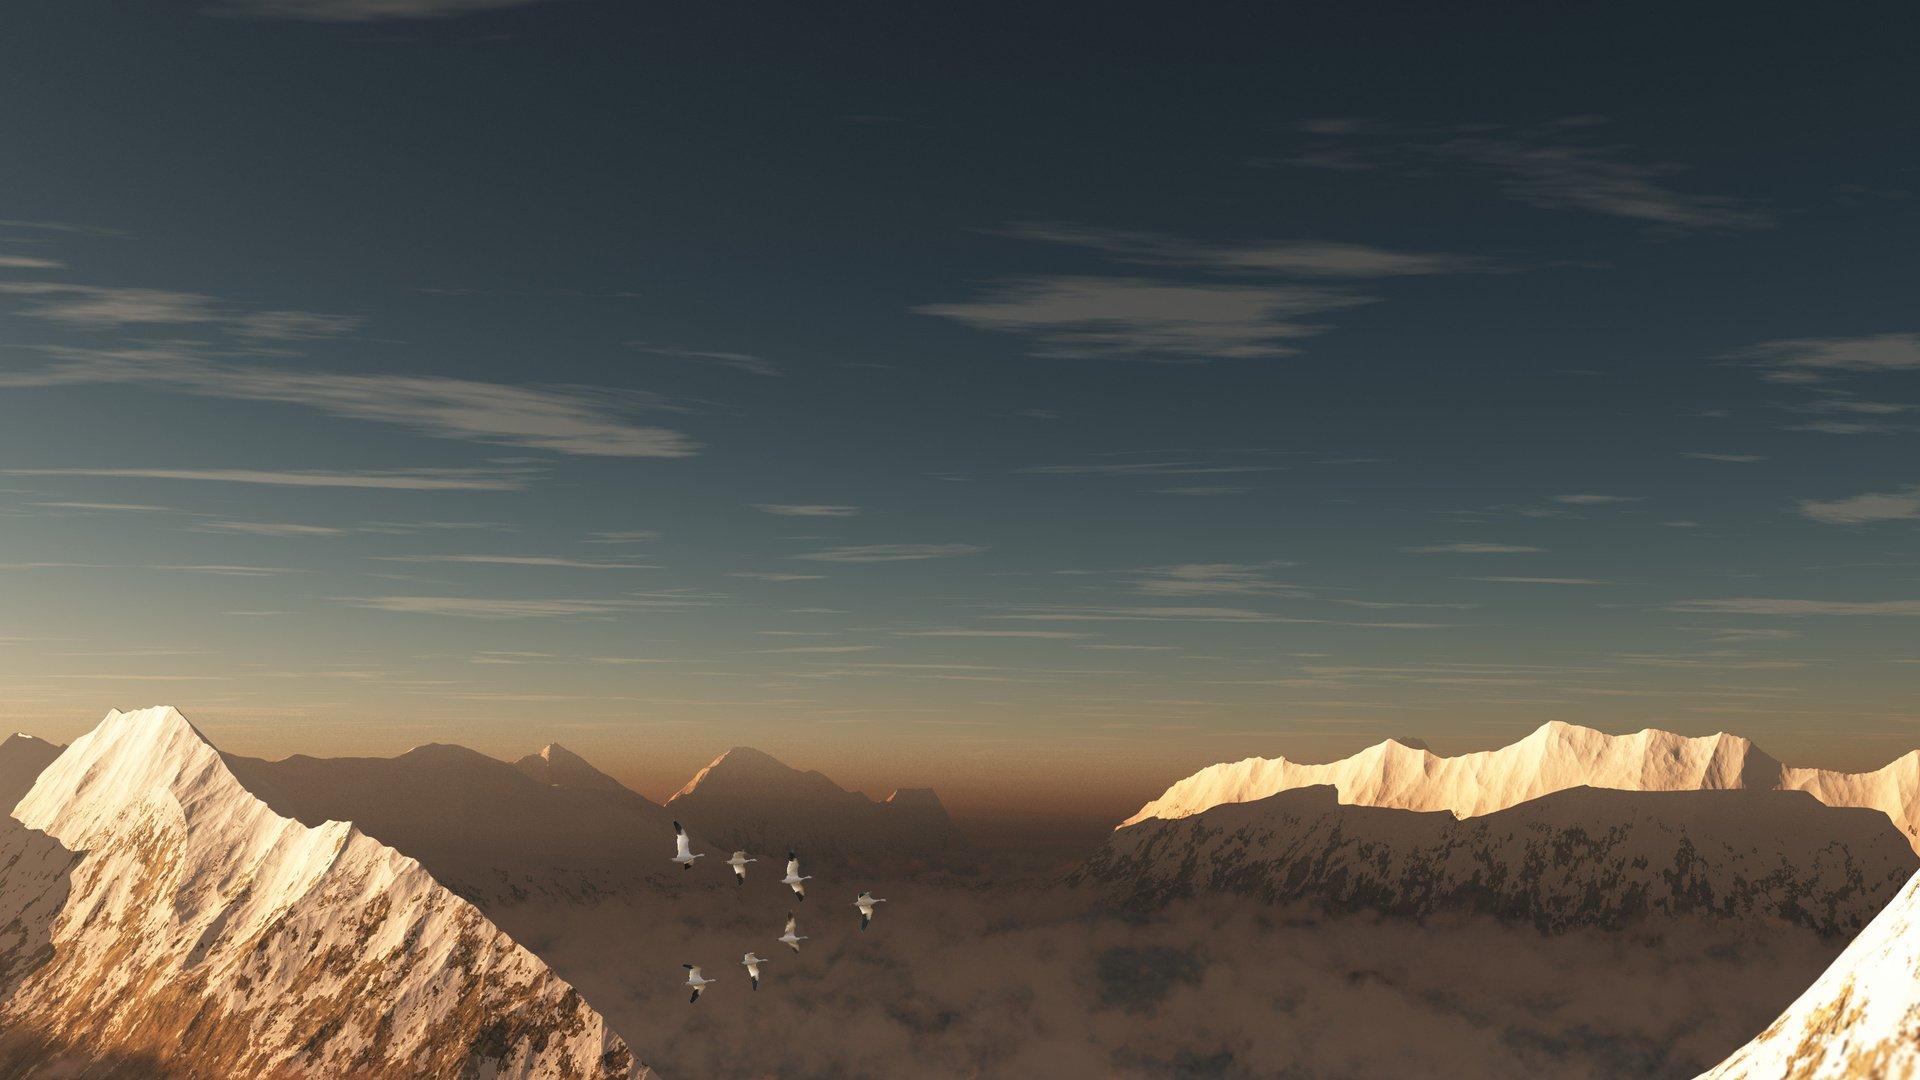 горы, небо, светило на телефон